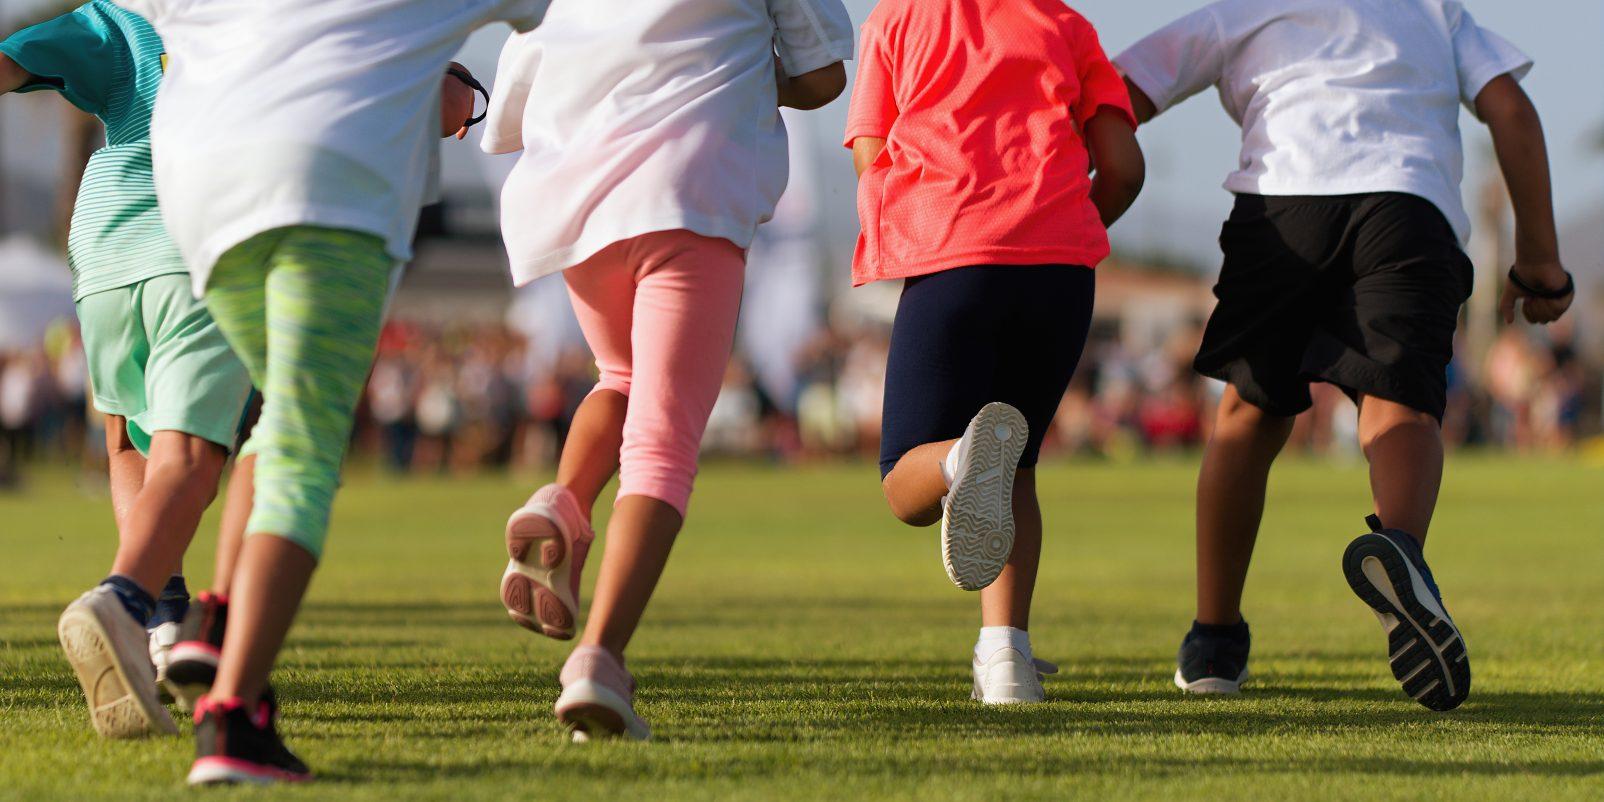 Running,Children,,Young,Athletes,Run,In,A,Kids,Run,Race,